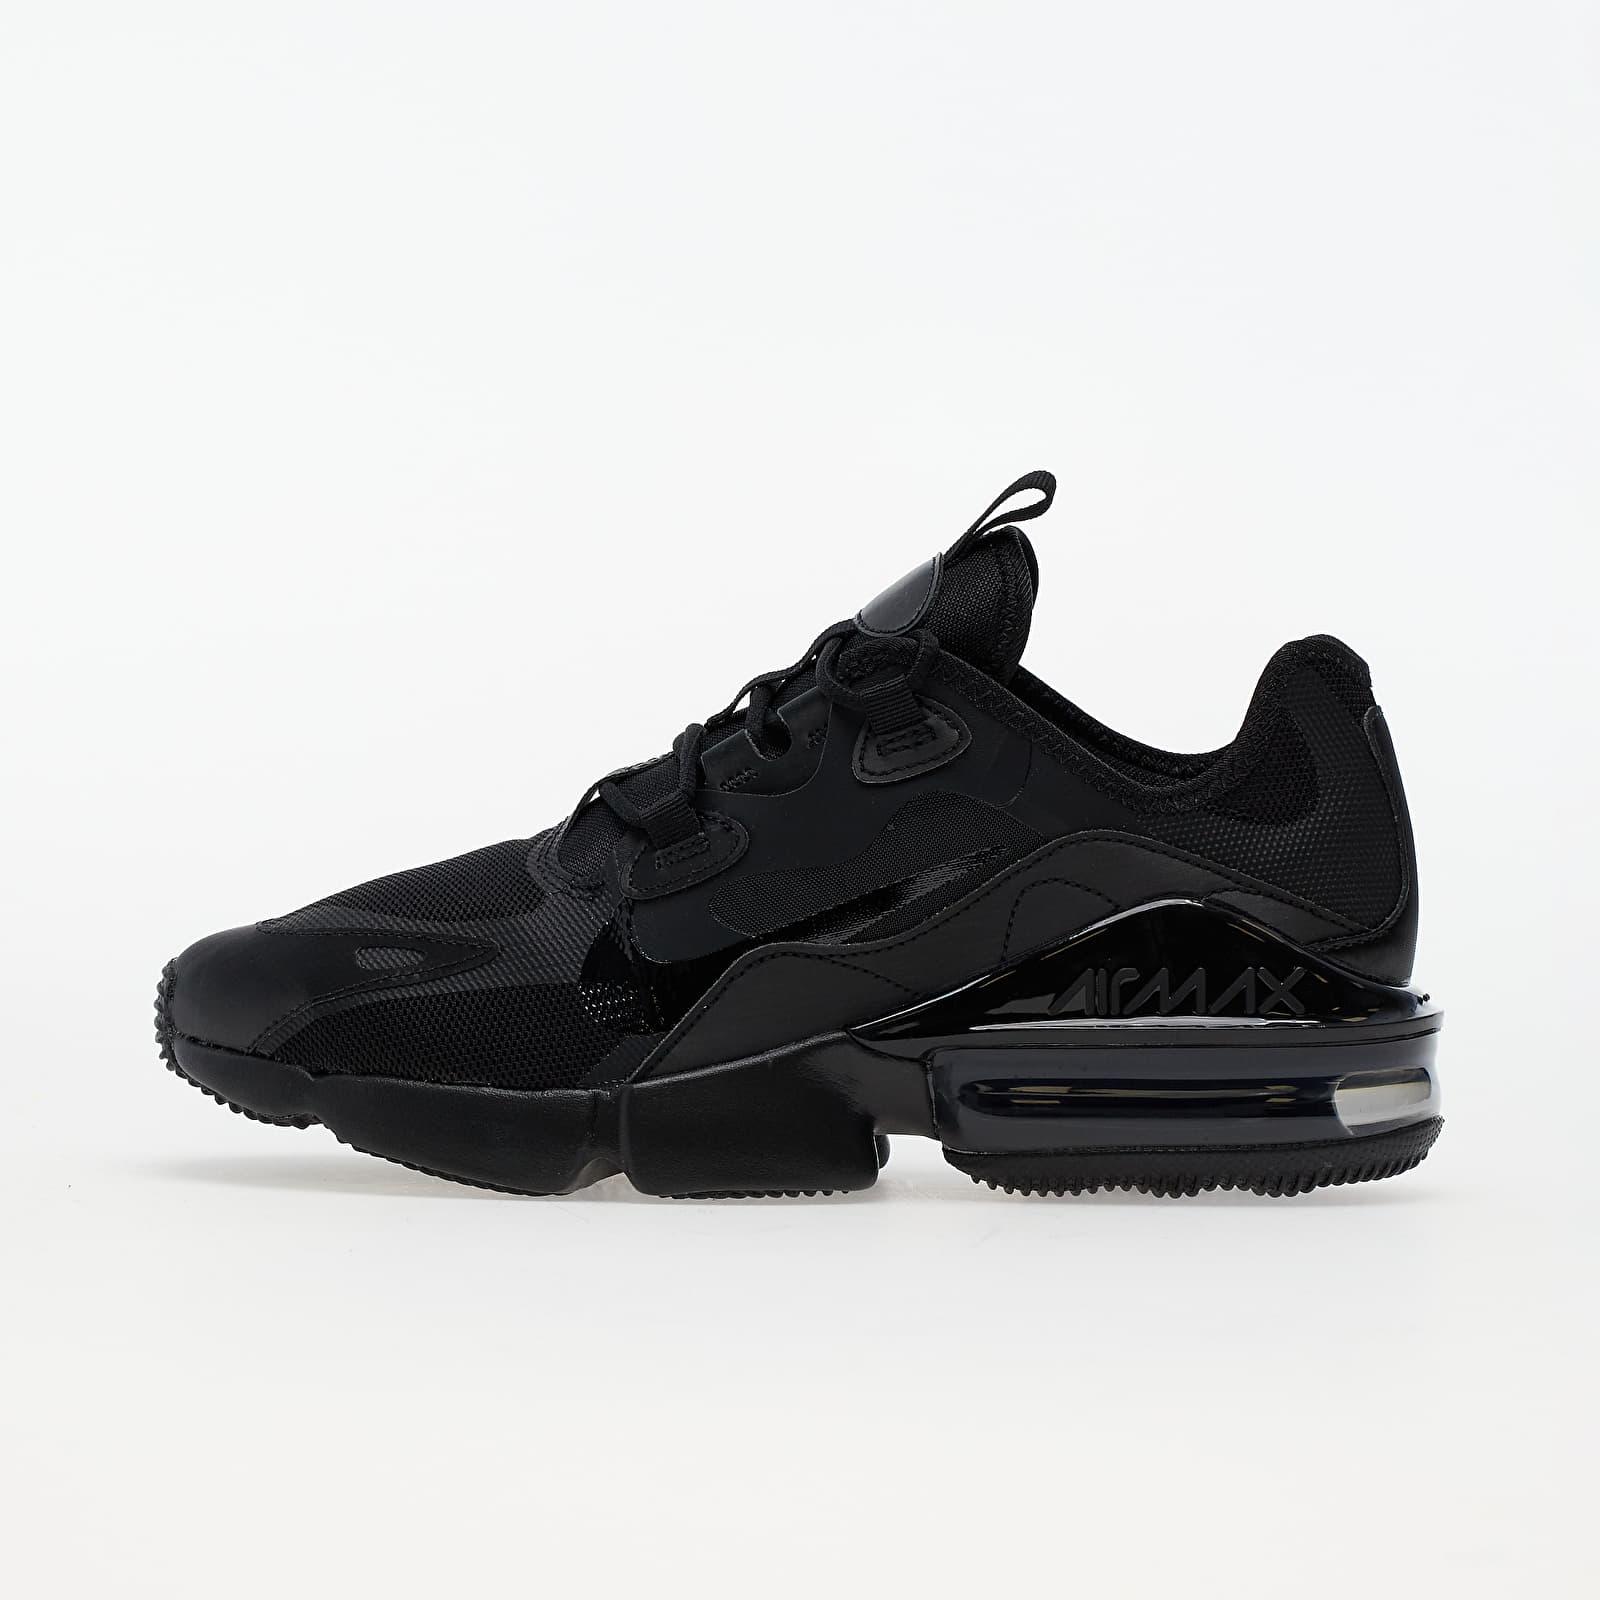 Nike Air Max Infinity 2 Black/ Black-Black-Anthracite EUR 45.5